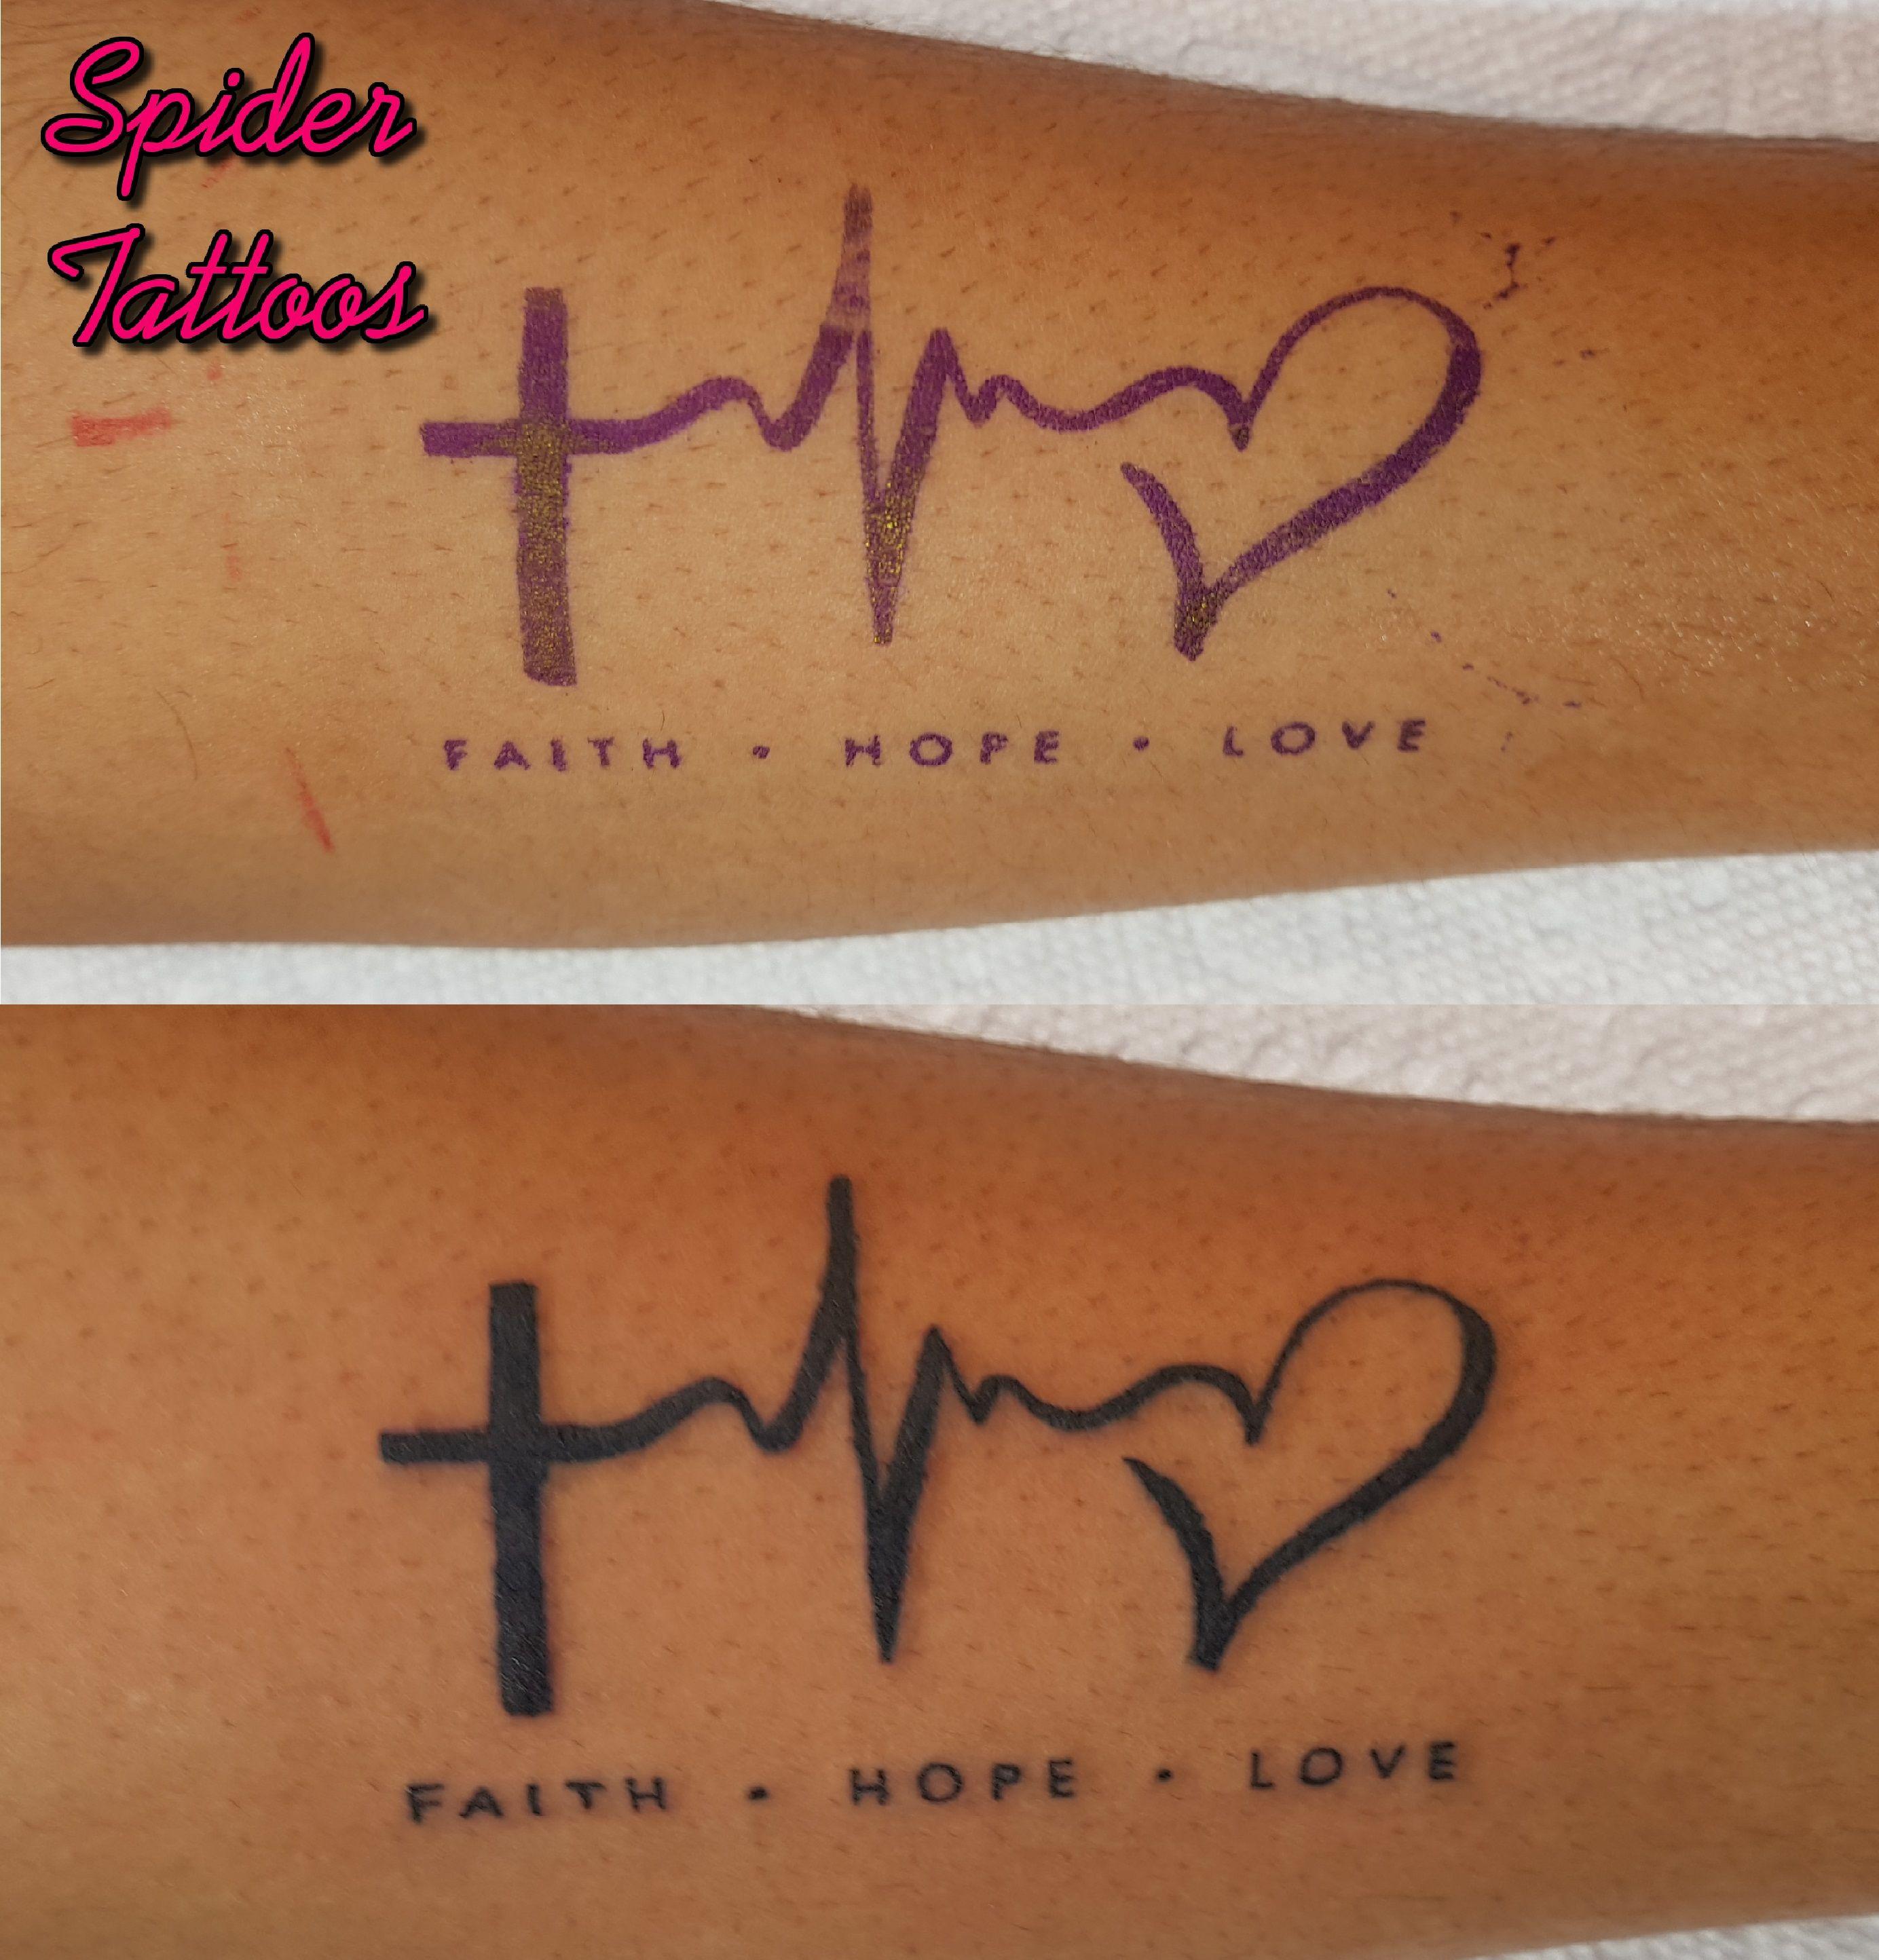 Faith Hope Love Symbol Tattoo By Spider Instagram